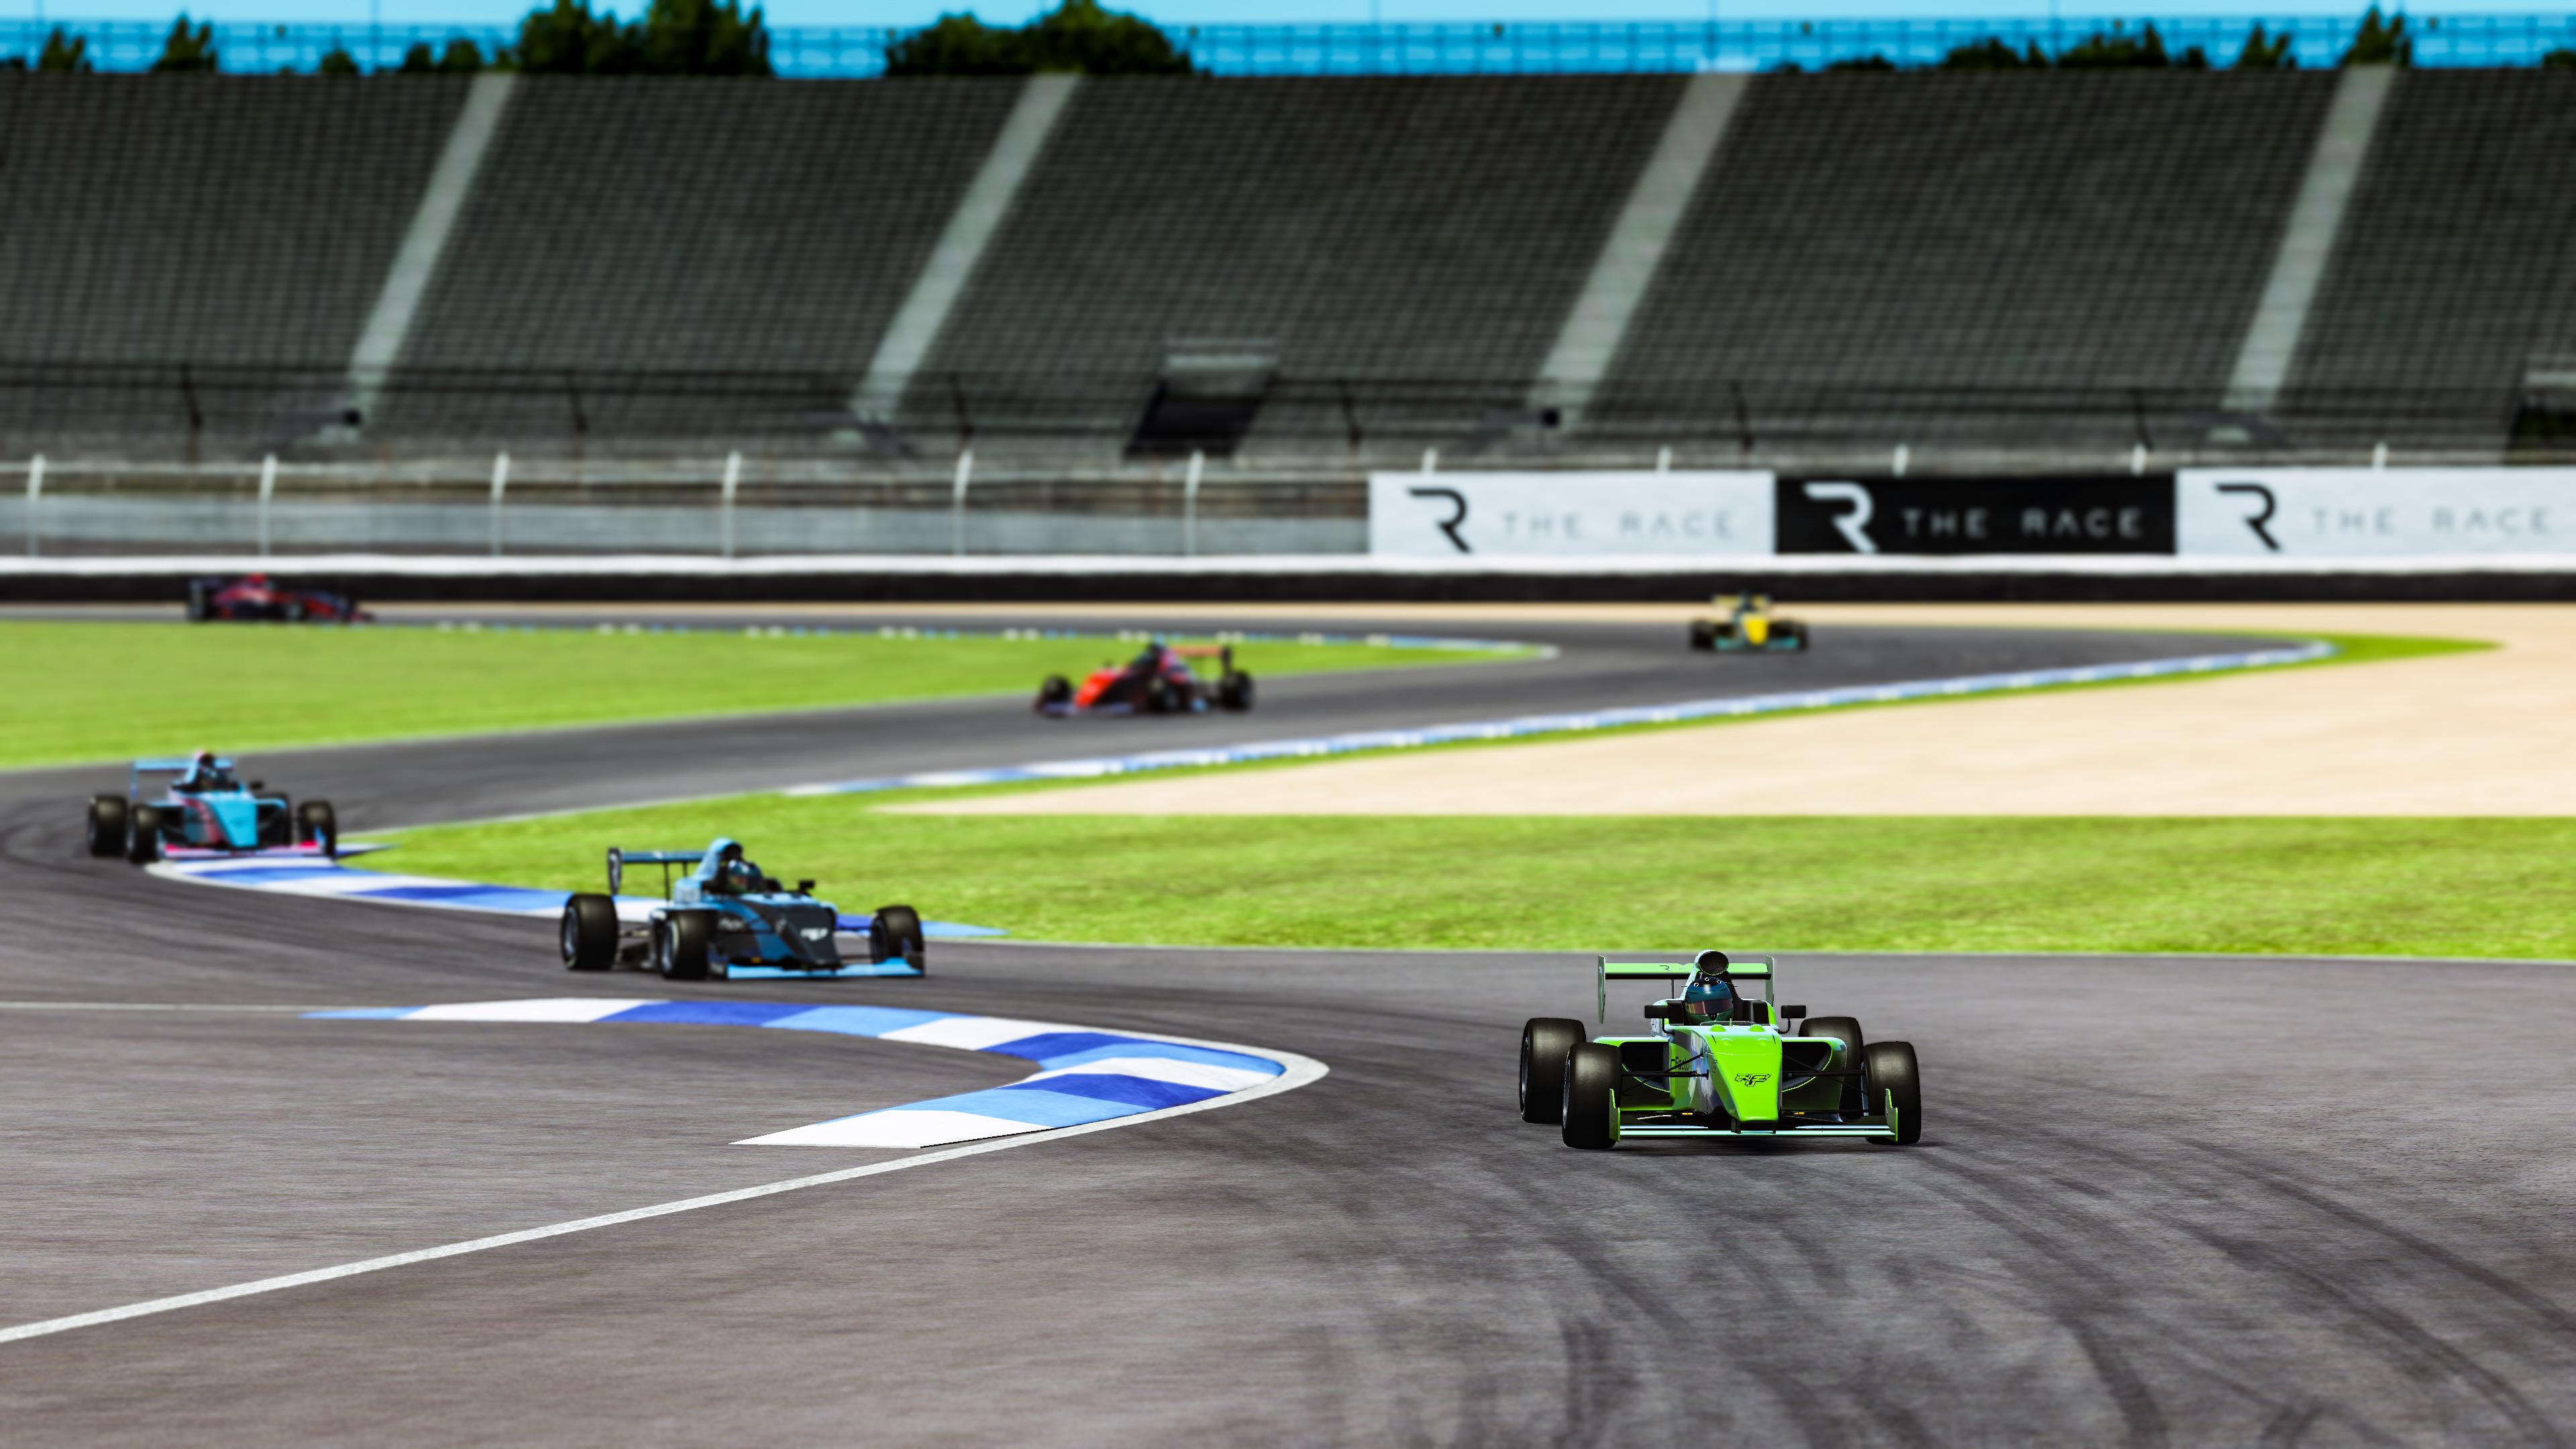 Therace Indyrace10